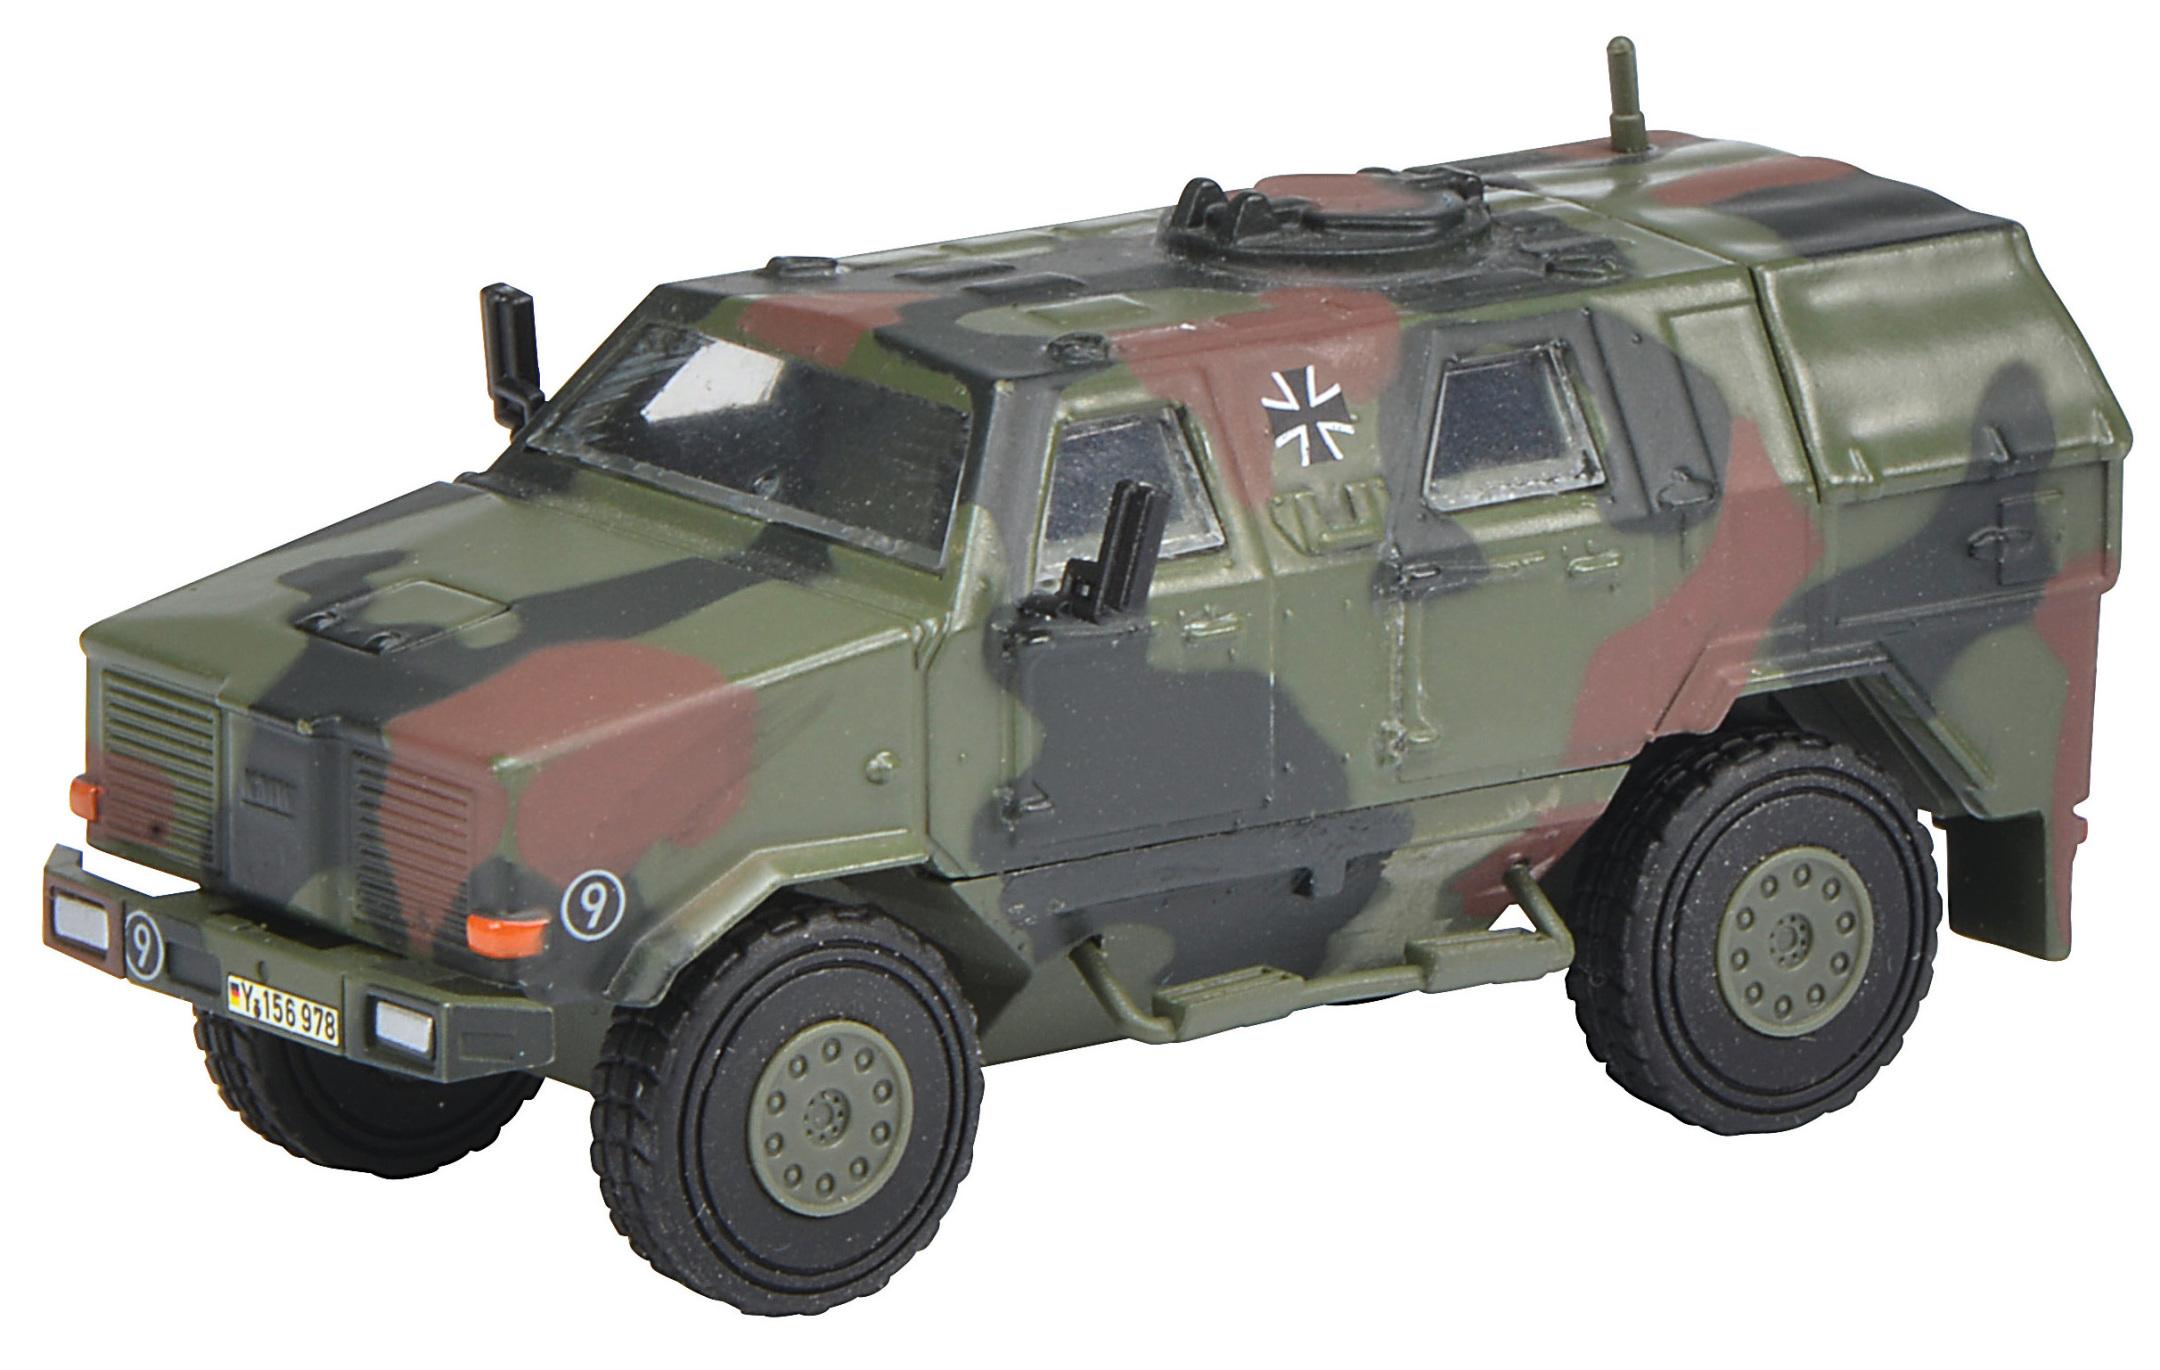 DINGO I Allschutzfahrzeug - Bundeswehr